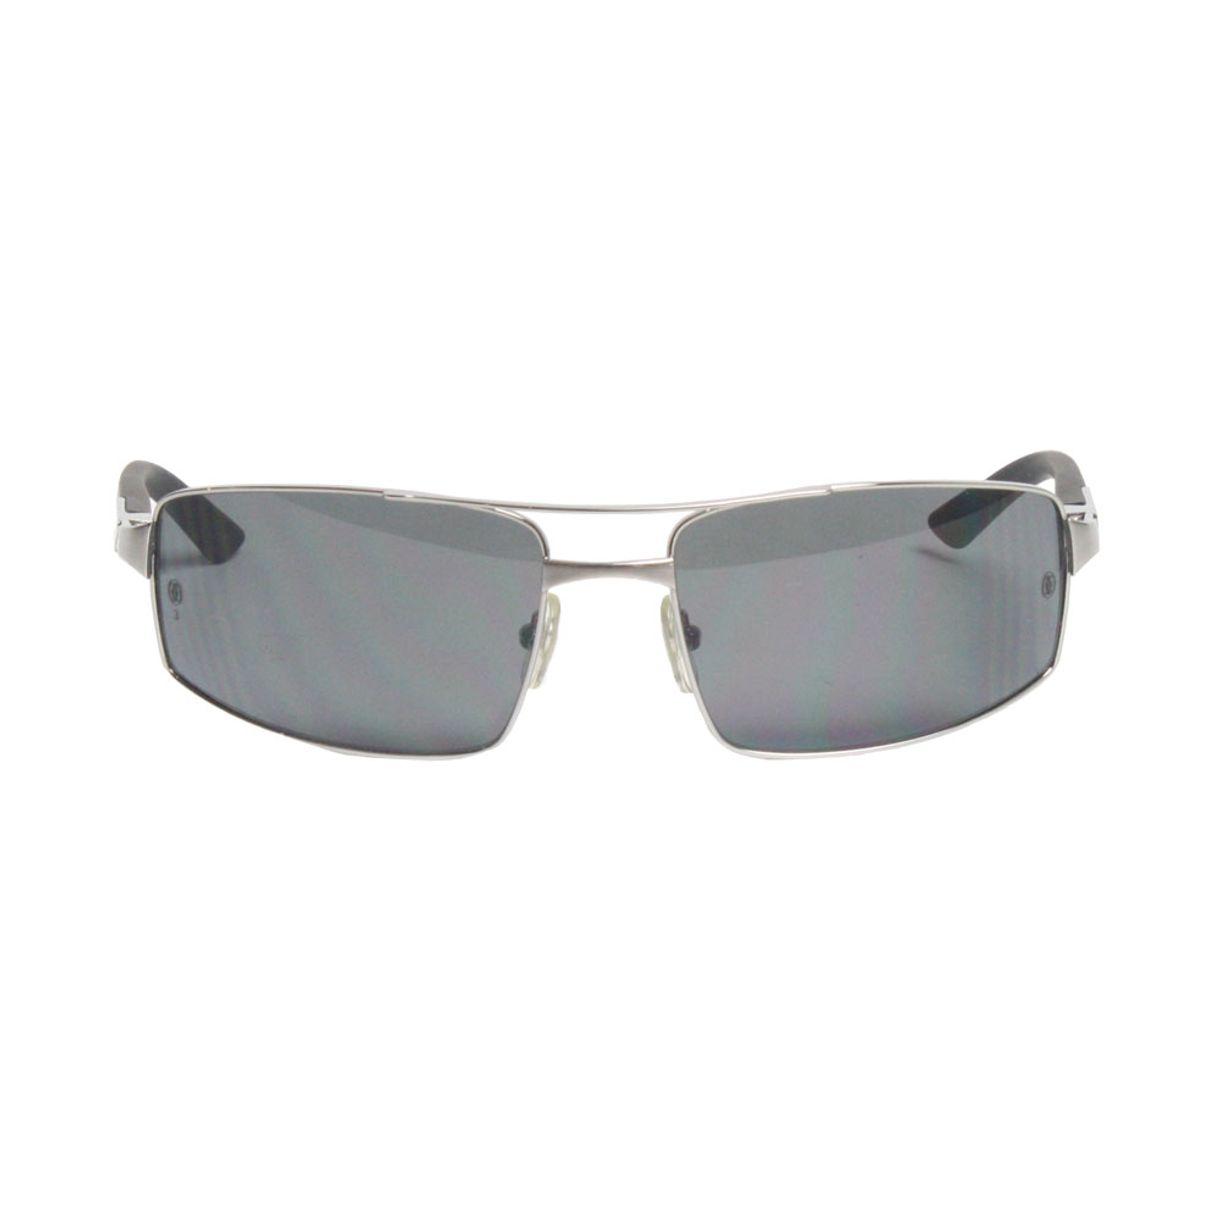 Oculos-Cartier-Masculino